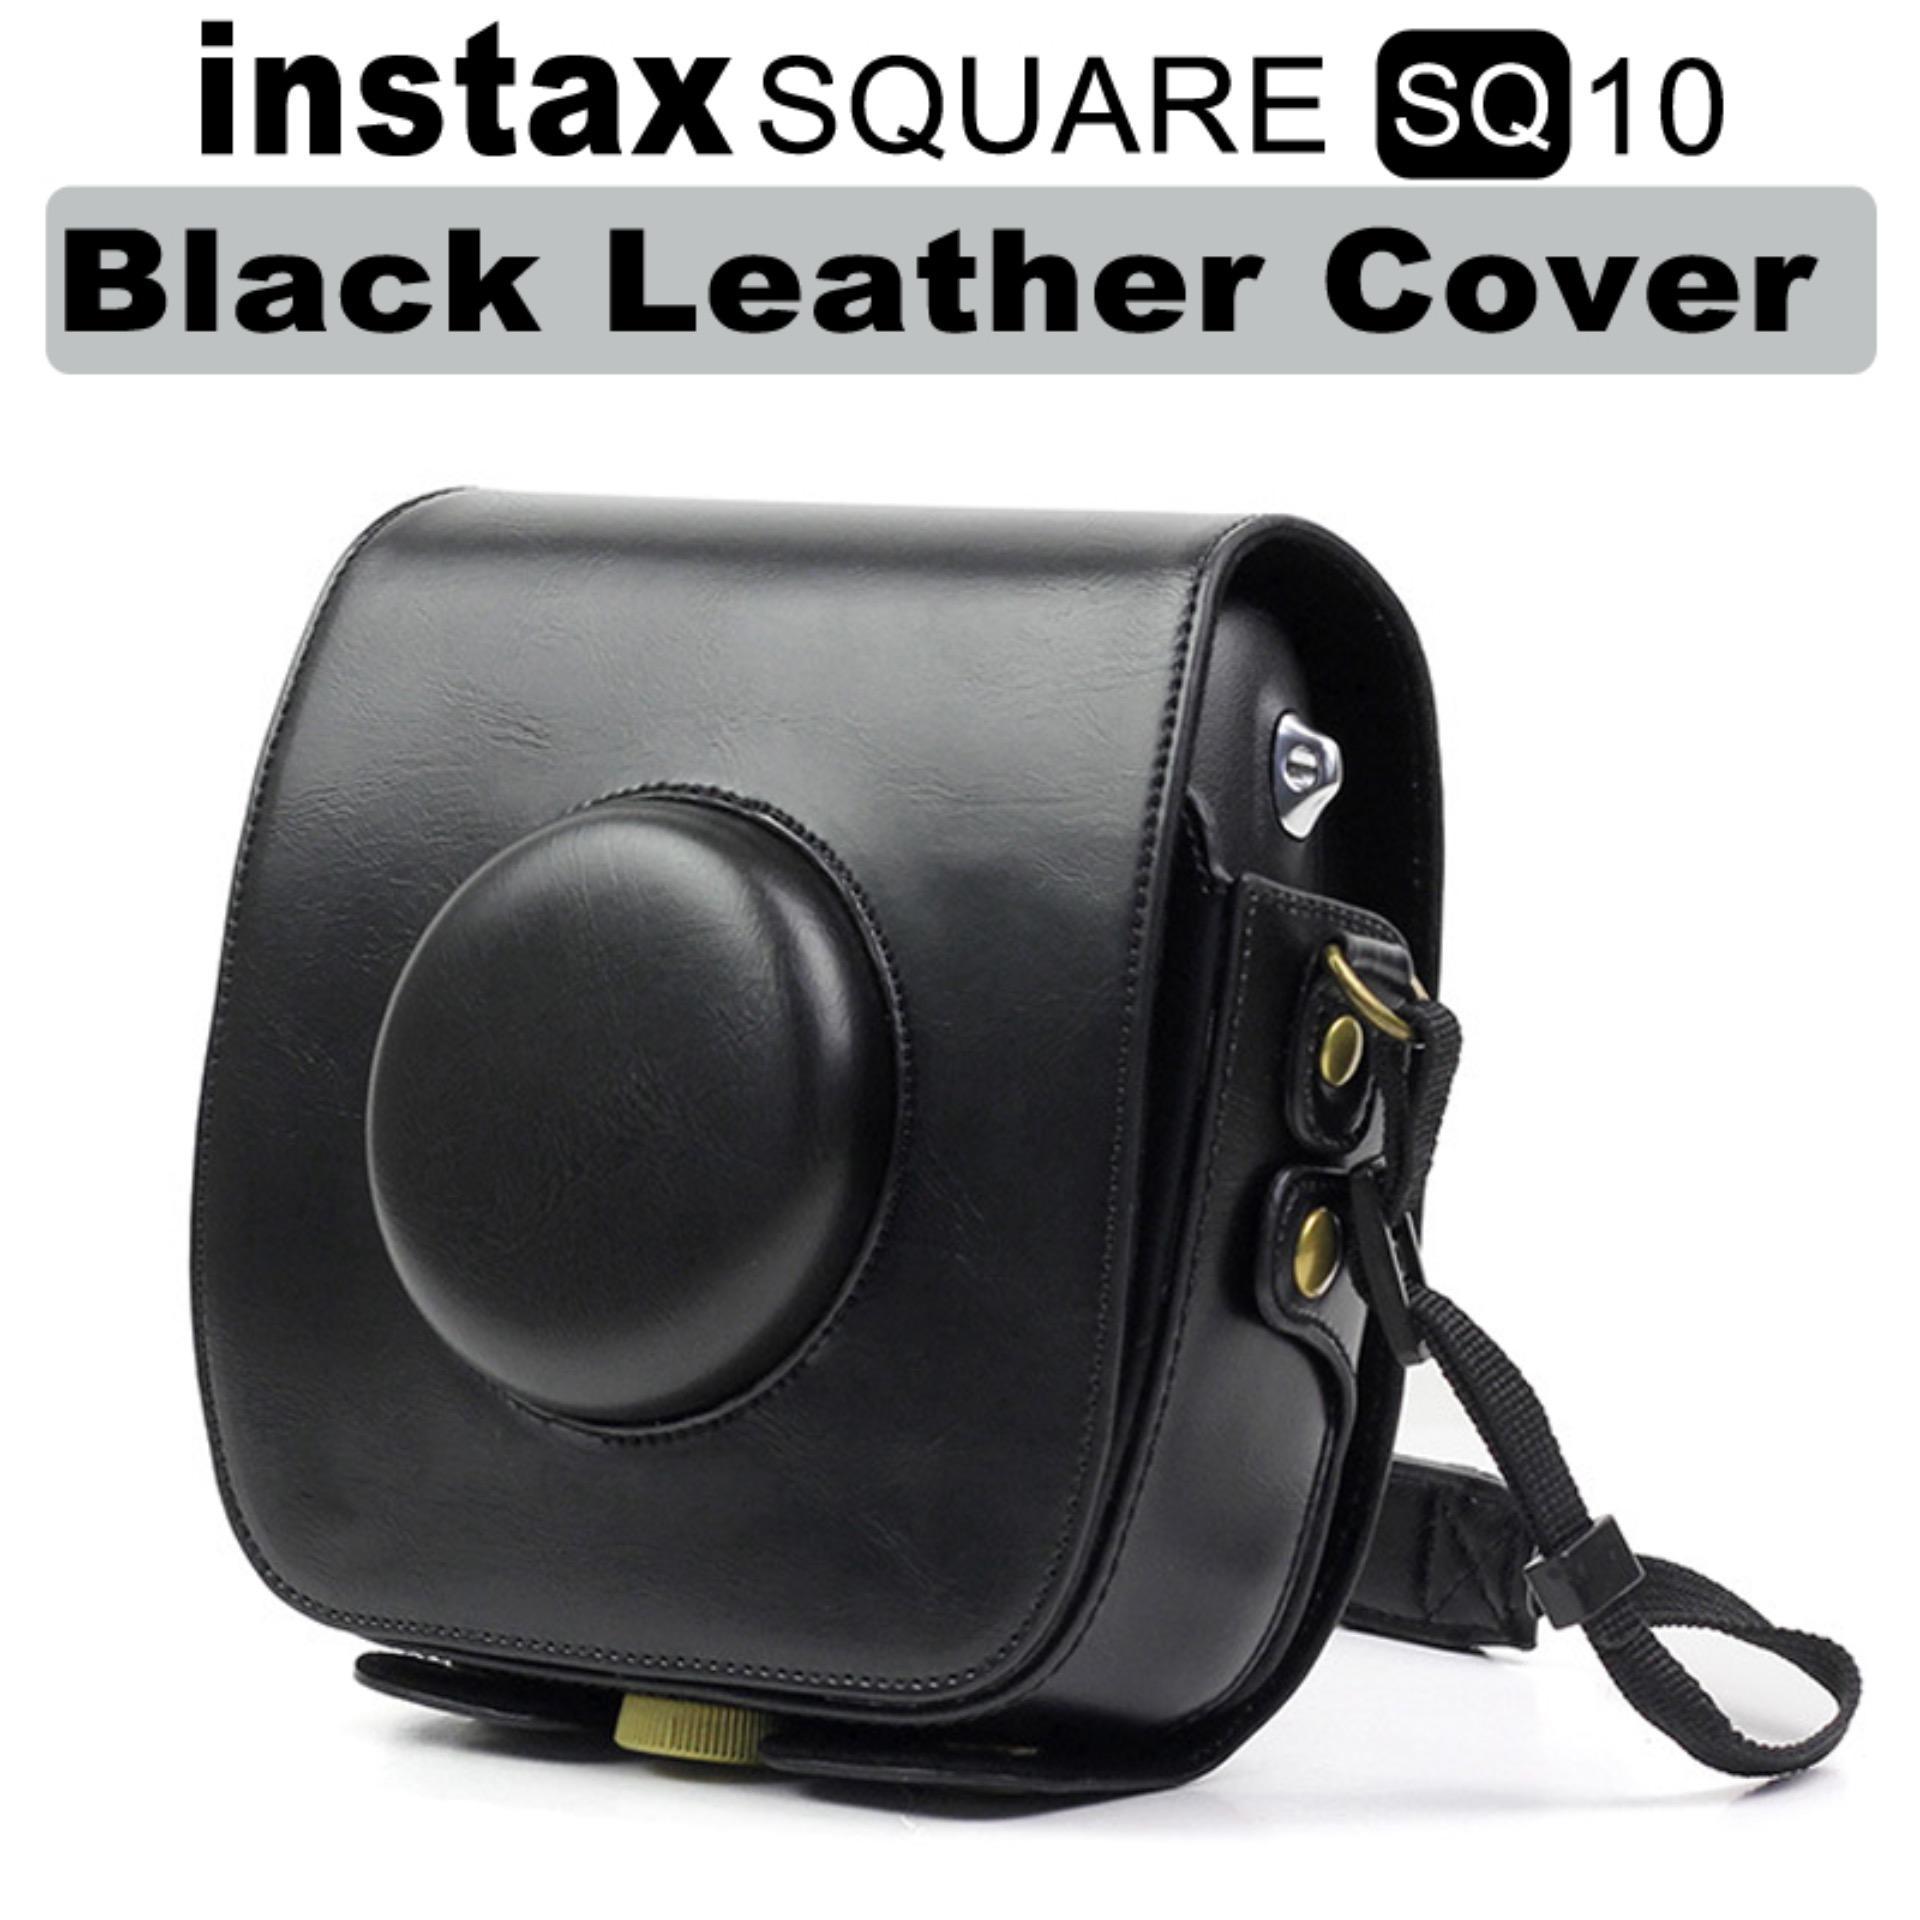 Fujifilm Instax Square SQ 10 Black Leather Cover Bag